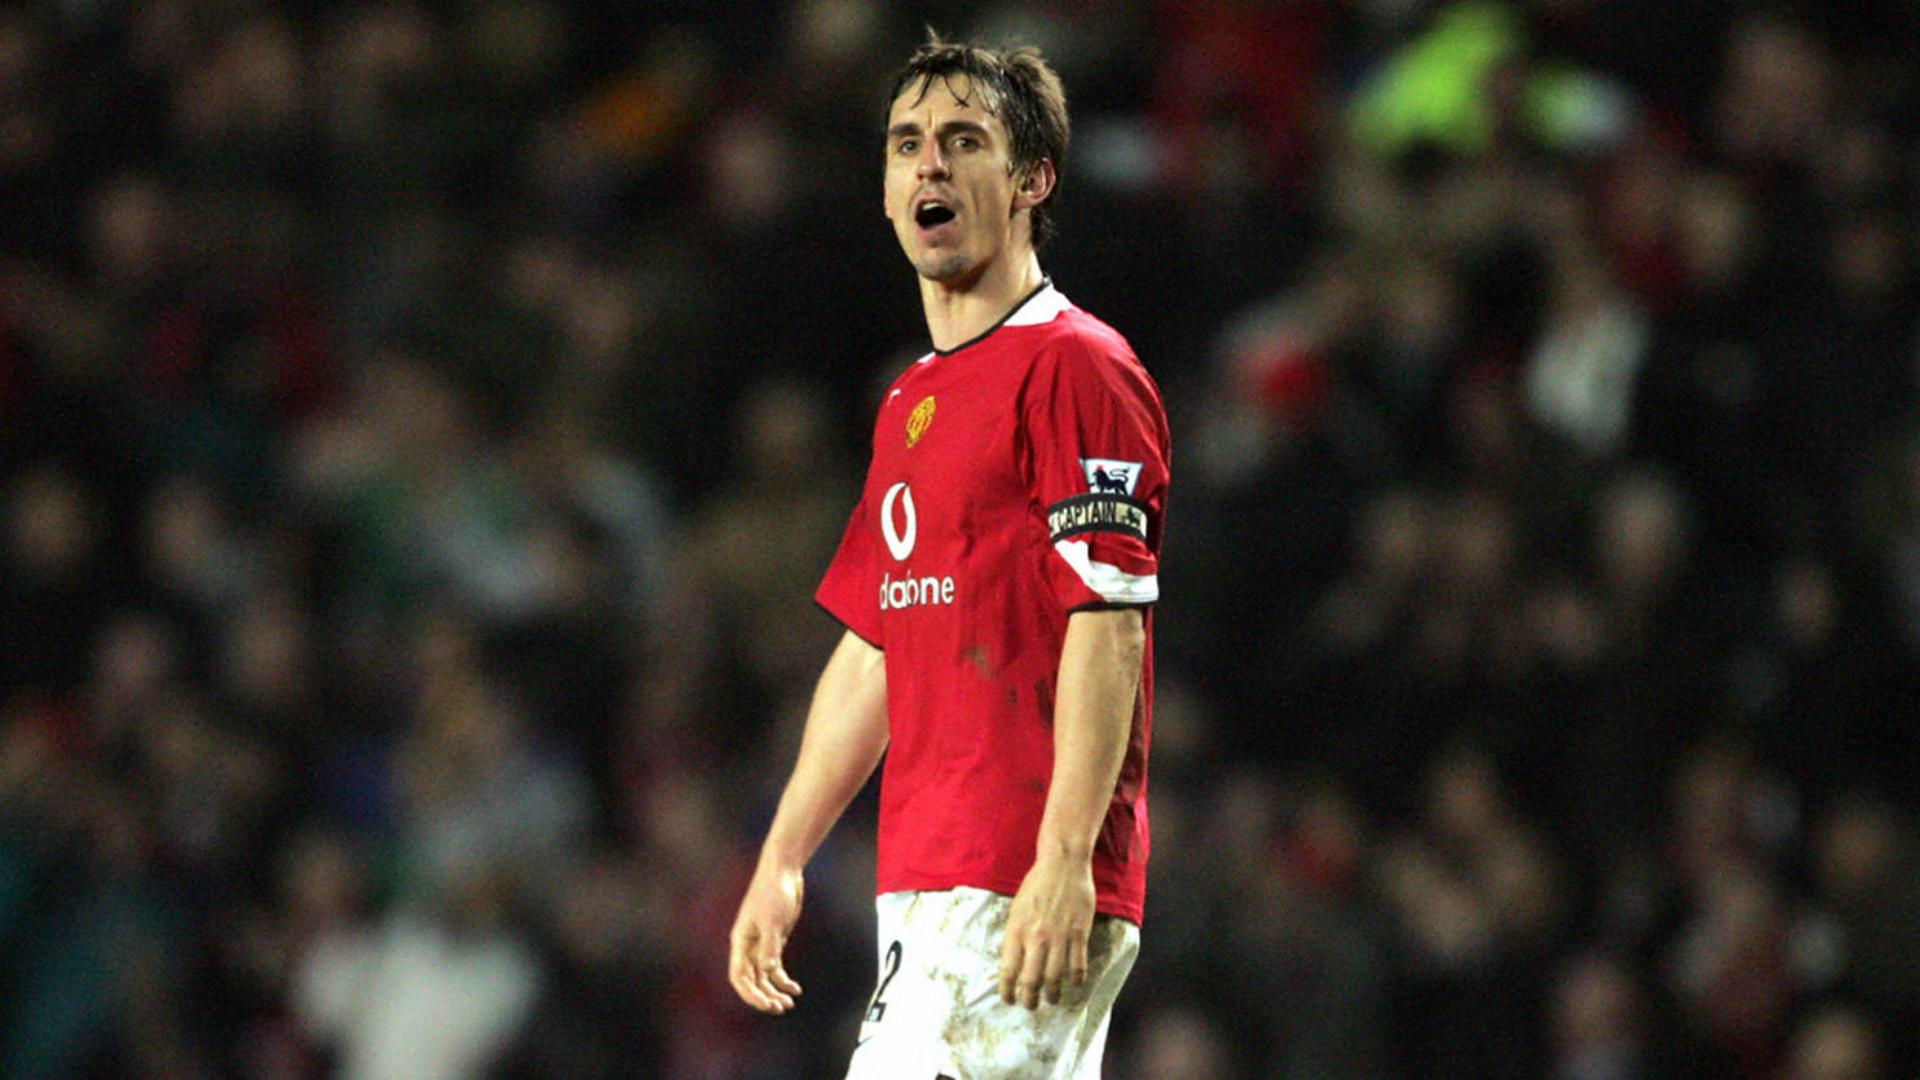 2006 - Man Utd 1-0 Liverpool - Gary Neville celebrates